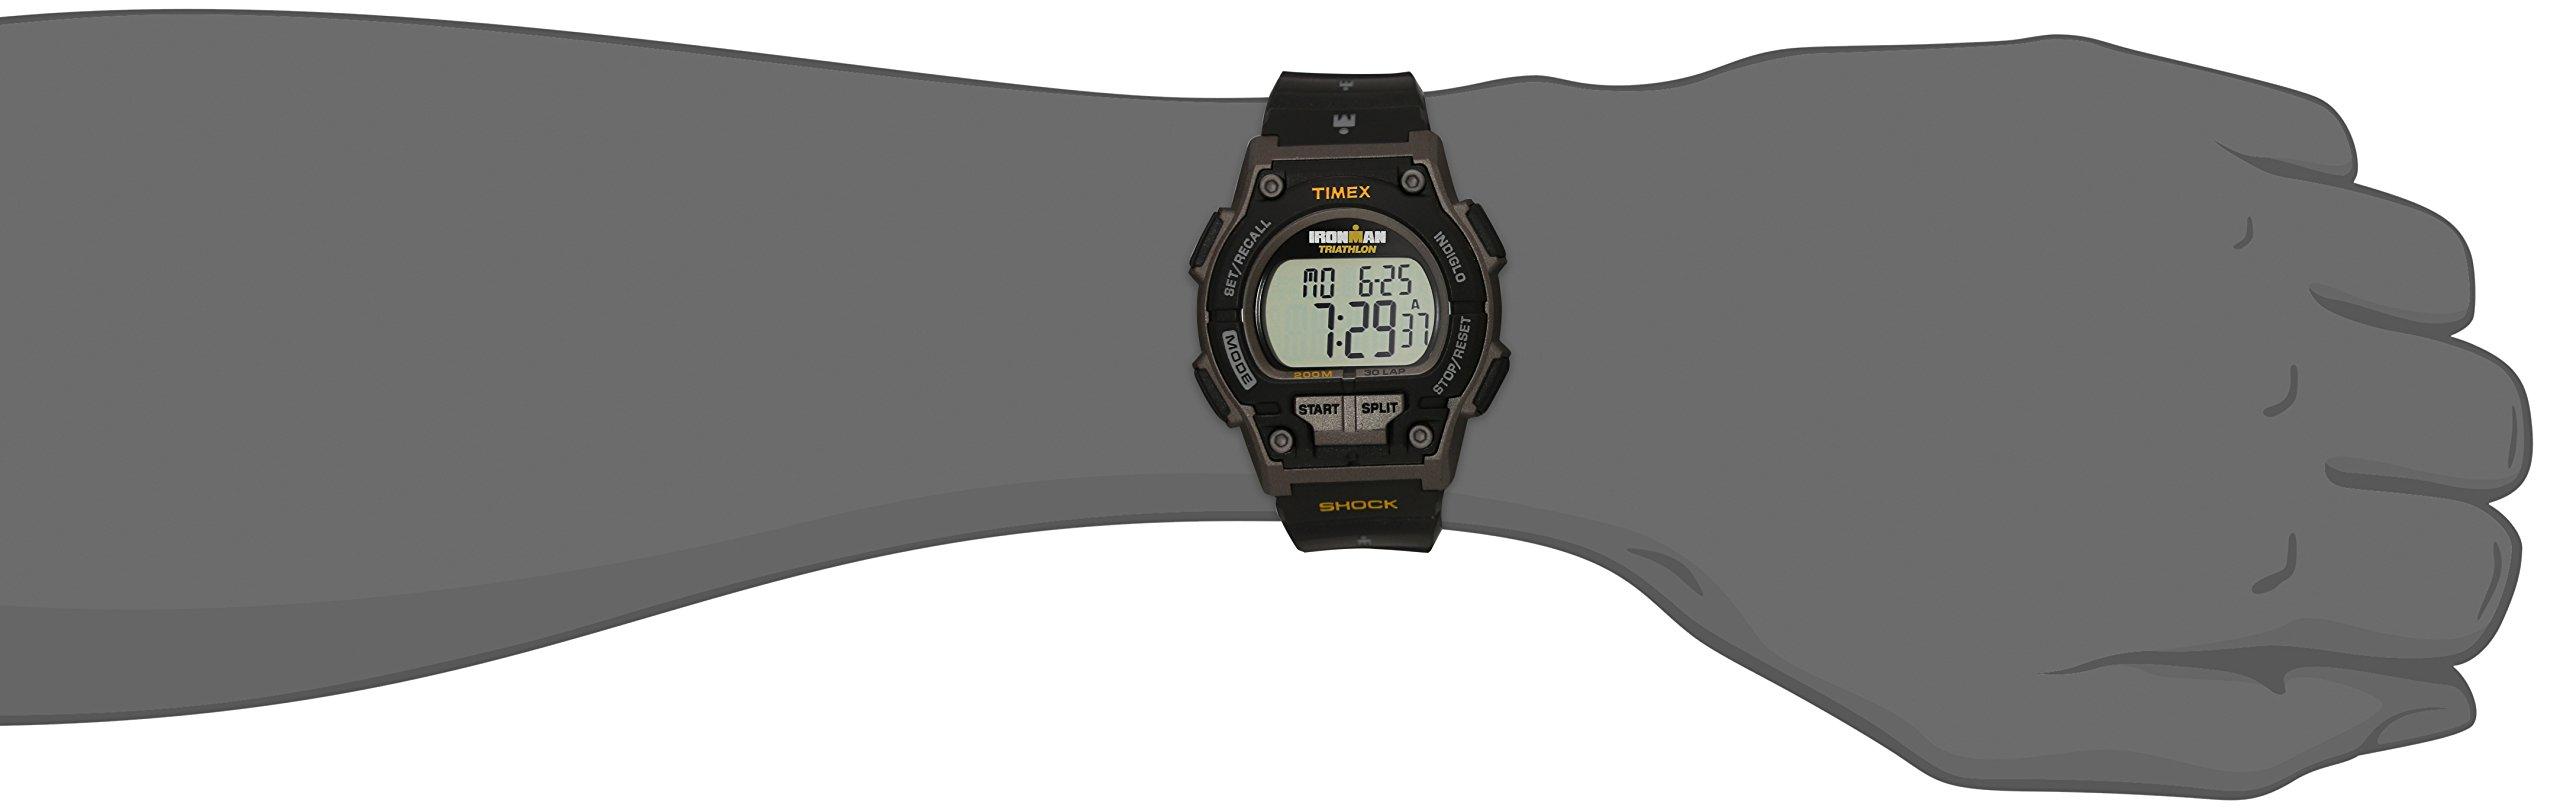 Reloj Timex Ironman Endure 30 Shock de tamaño completo